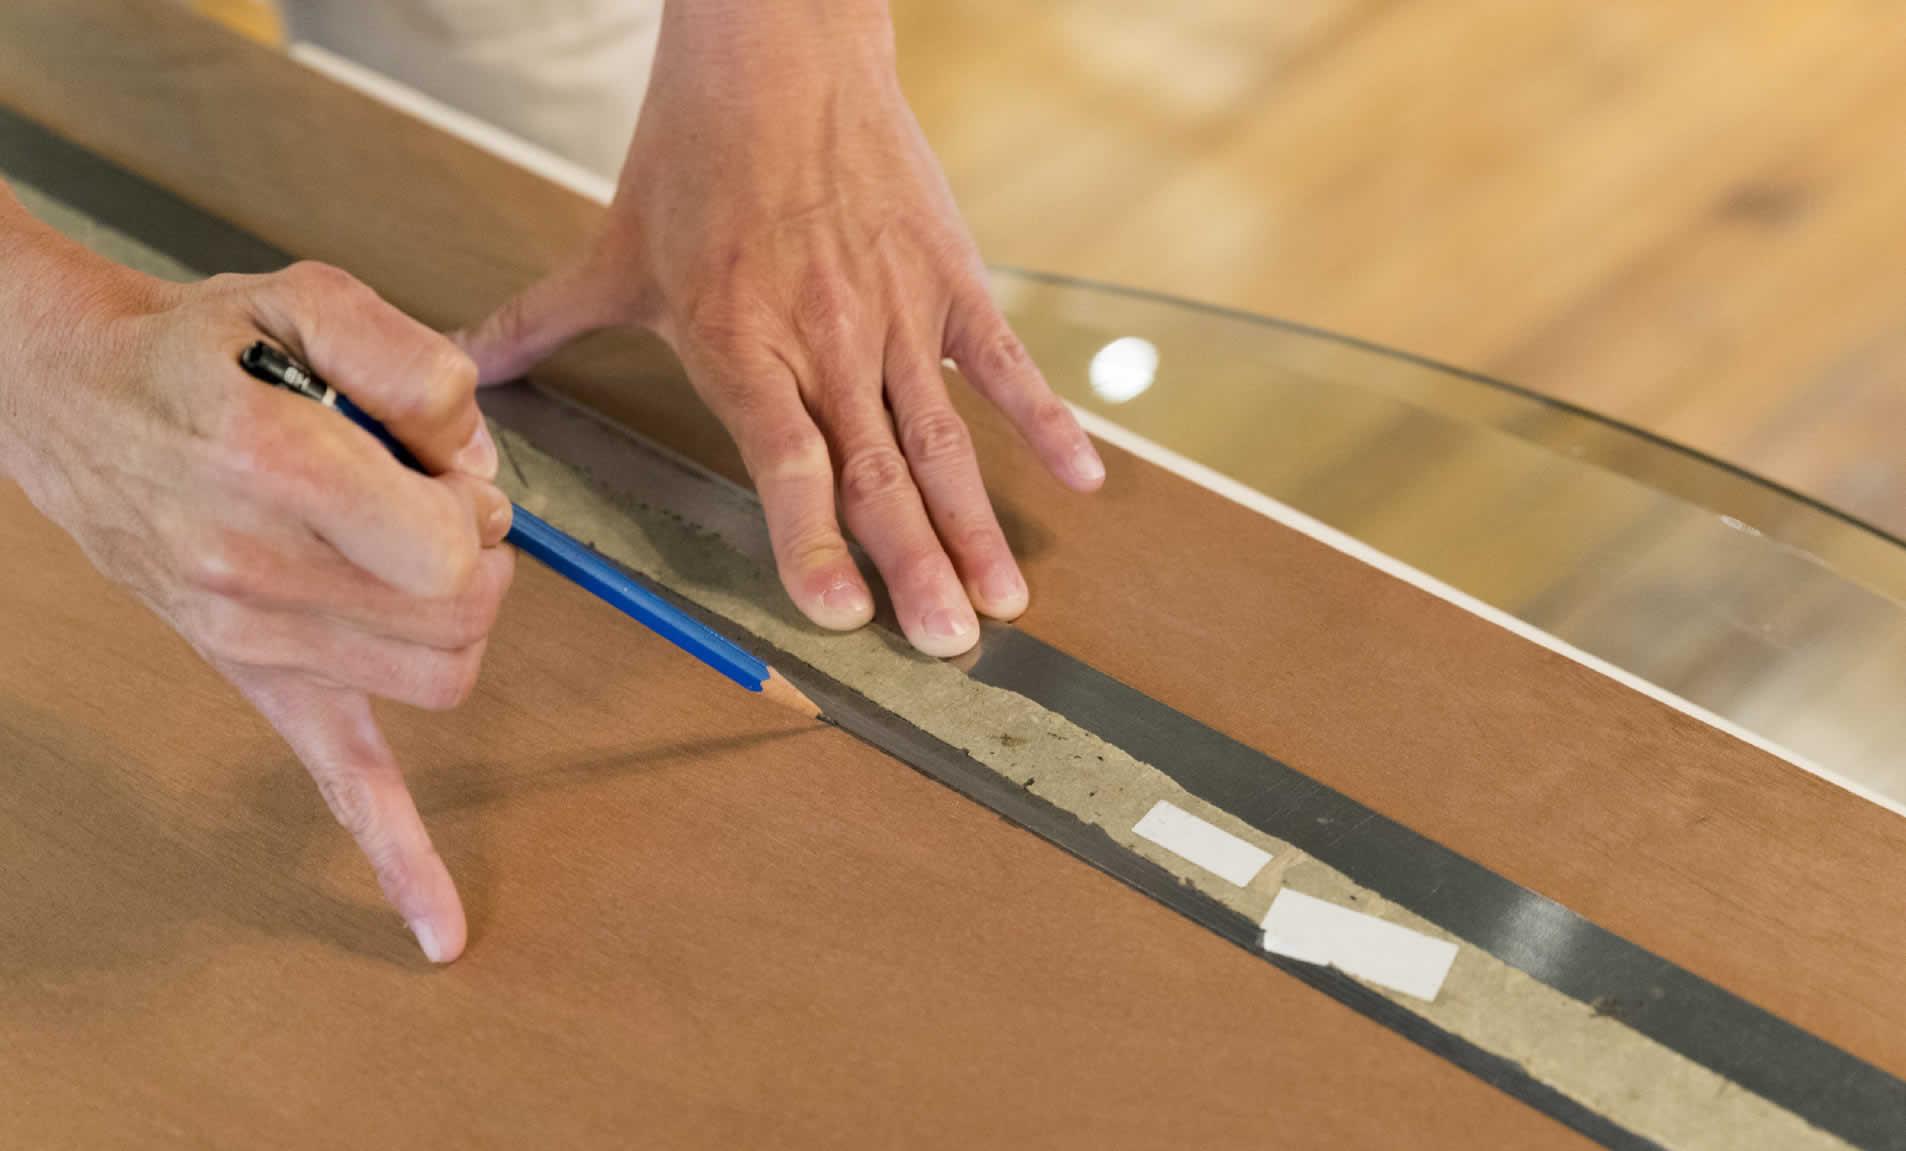 rivet-door-arrow-project-step3a.jpg